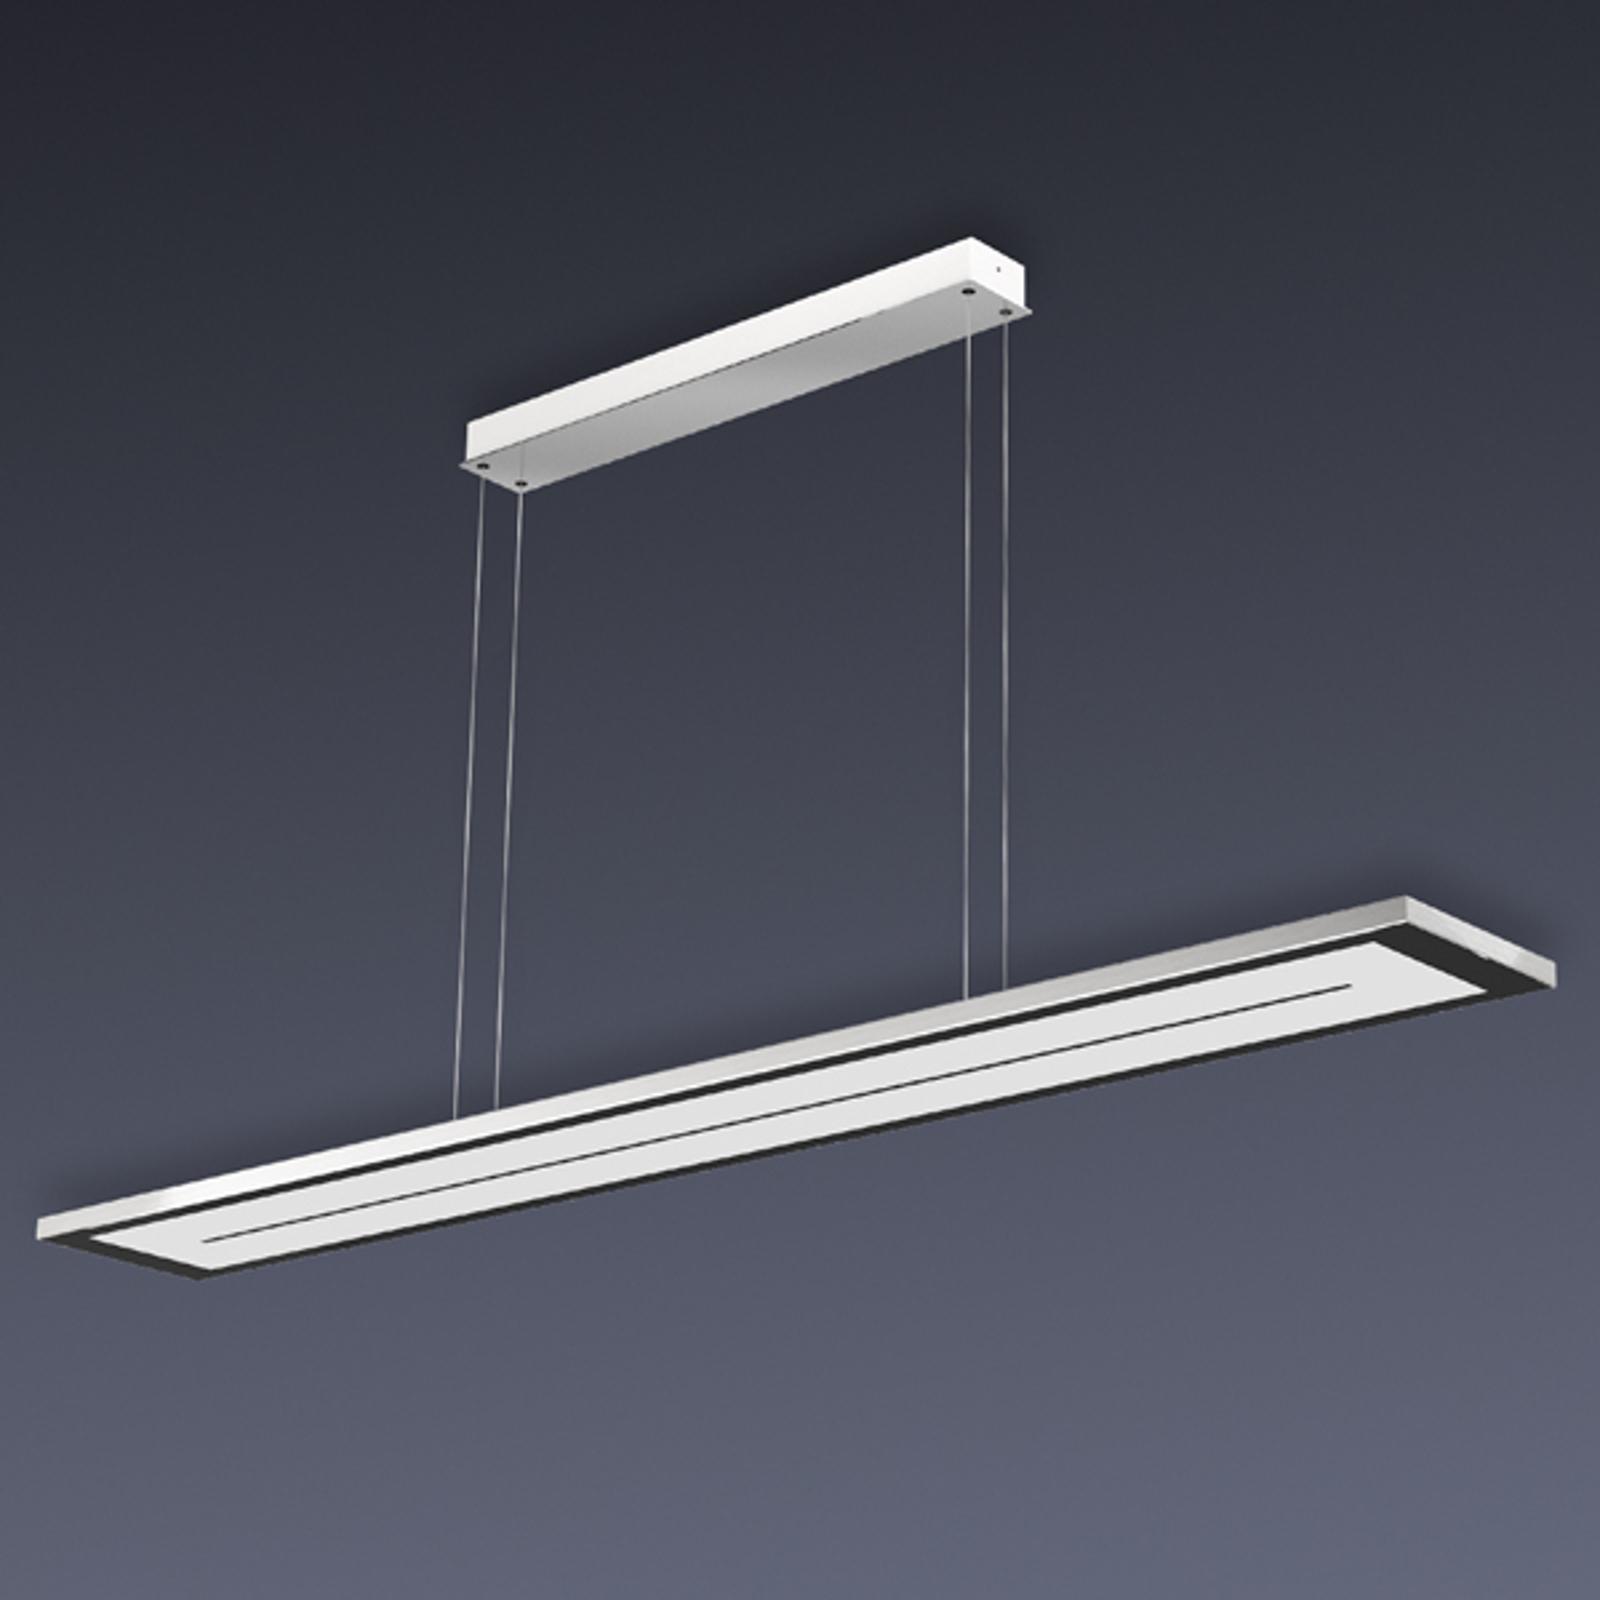 Lámpara LED colgante Zen - 138 cm